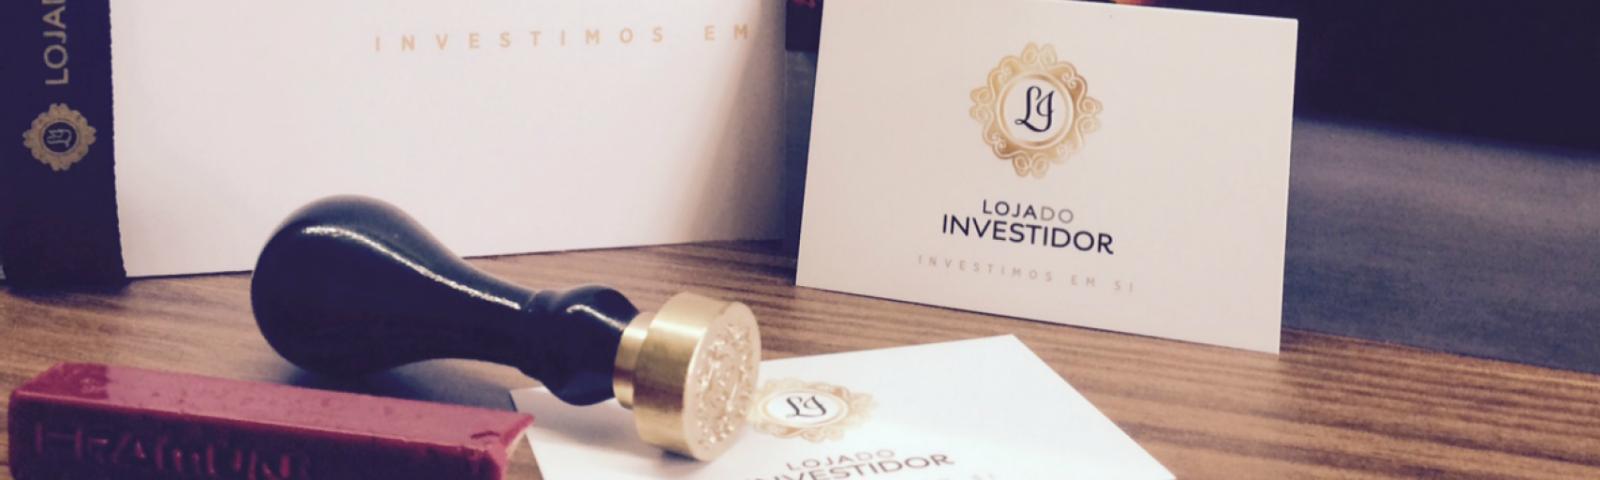 Loja do Investidor chega a Chaves